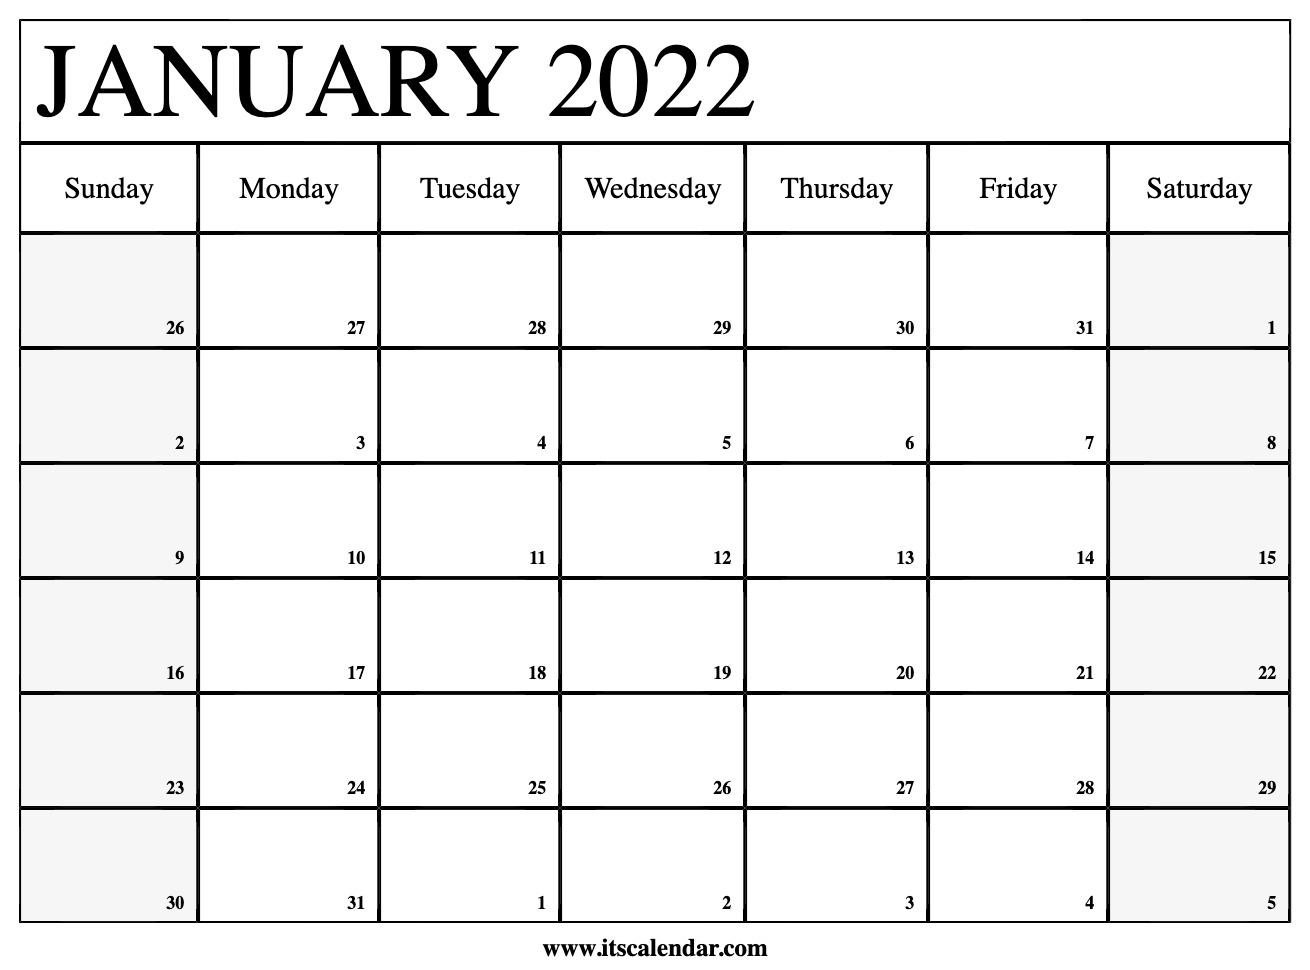 Free Printable January 2022 Calendar Throughout 2022 January Blank Calendar